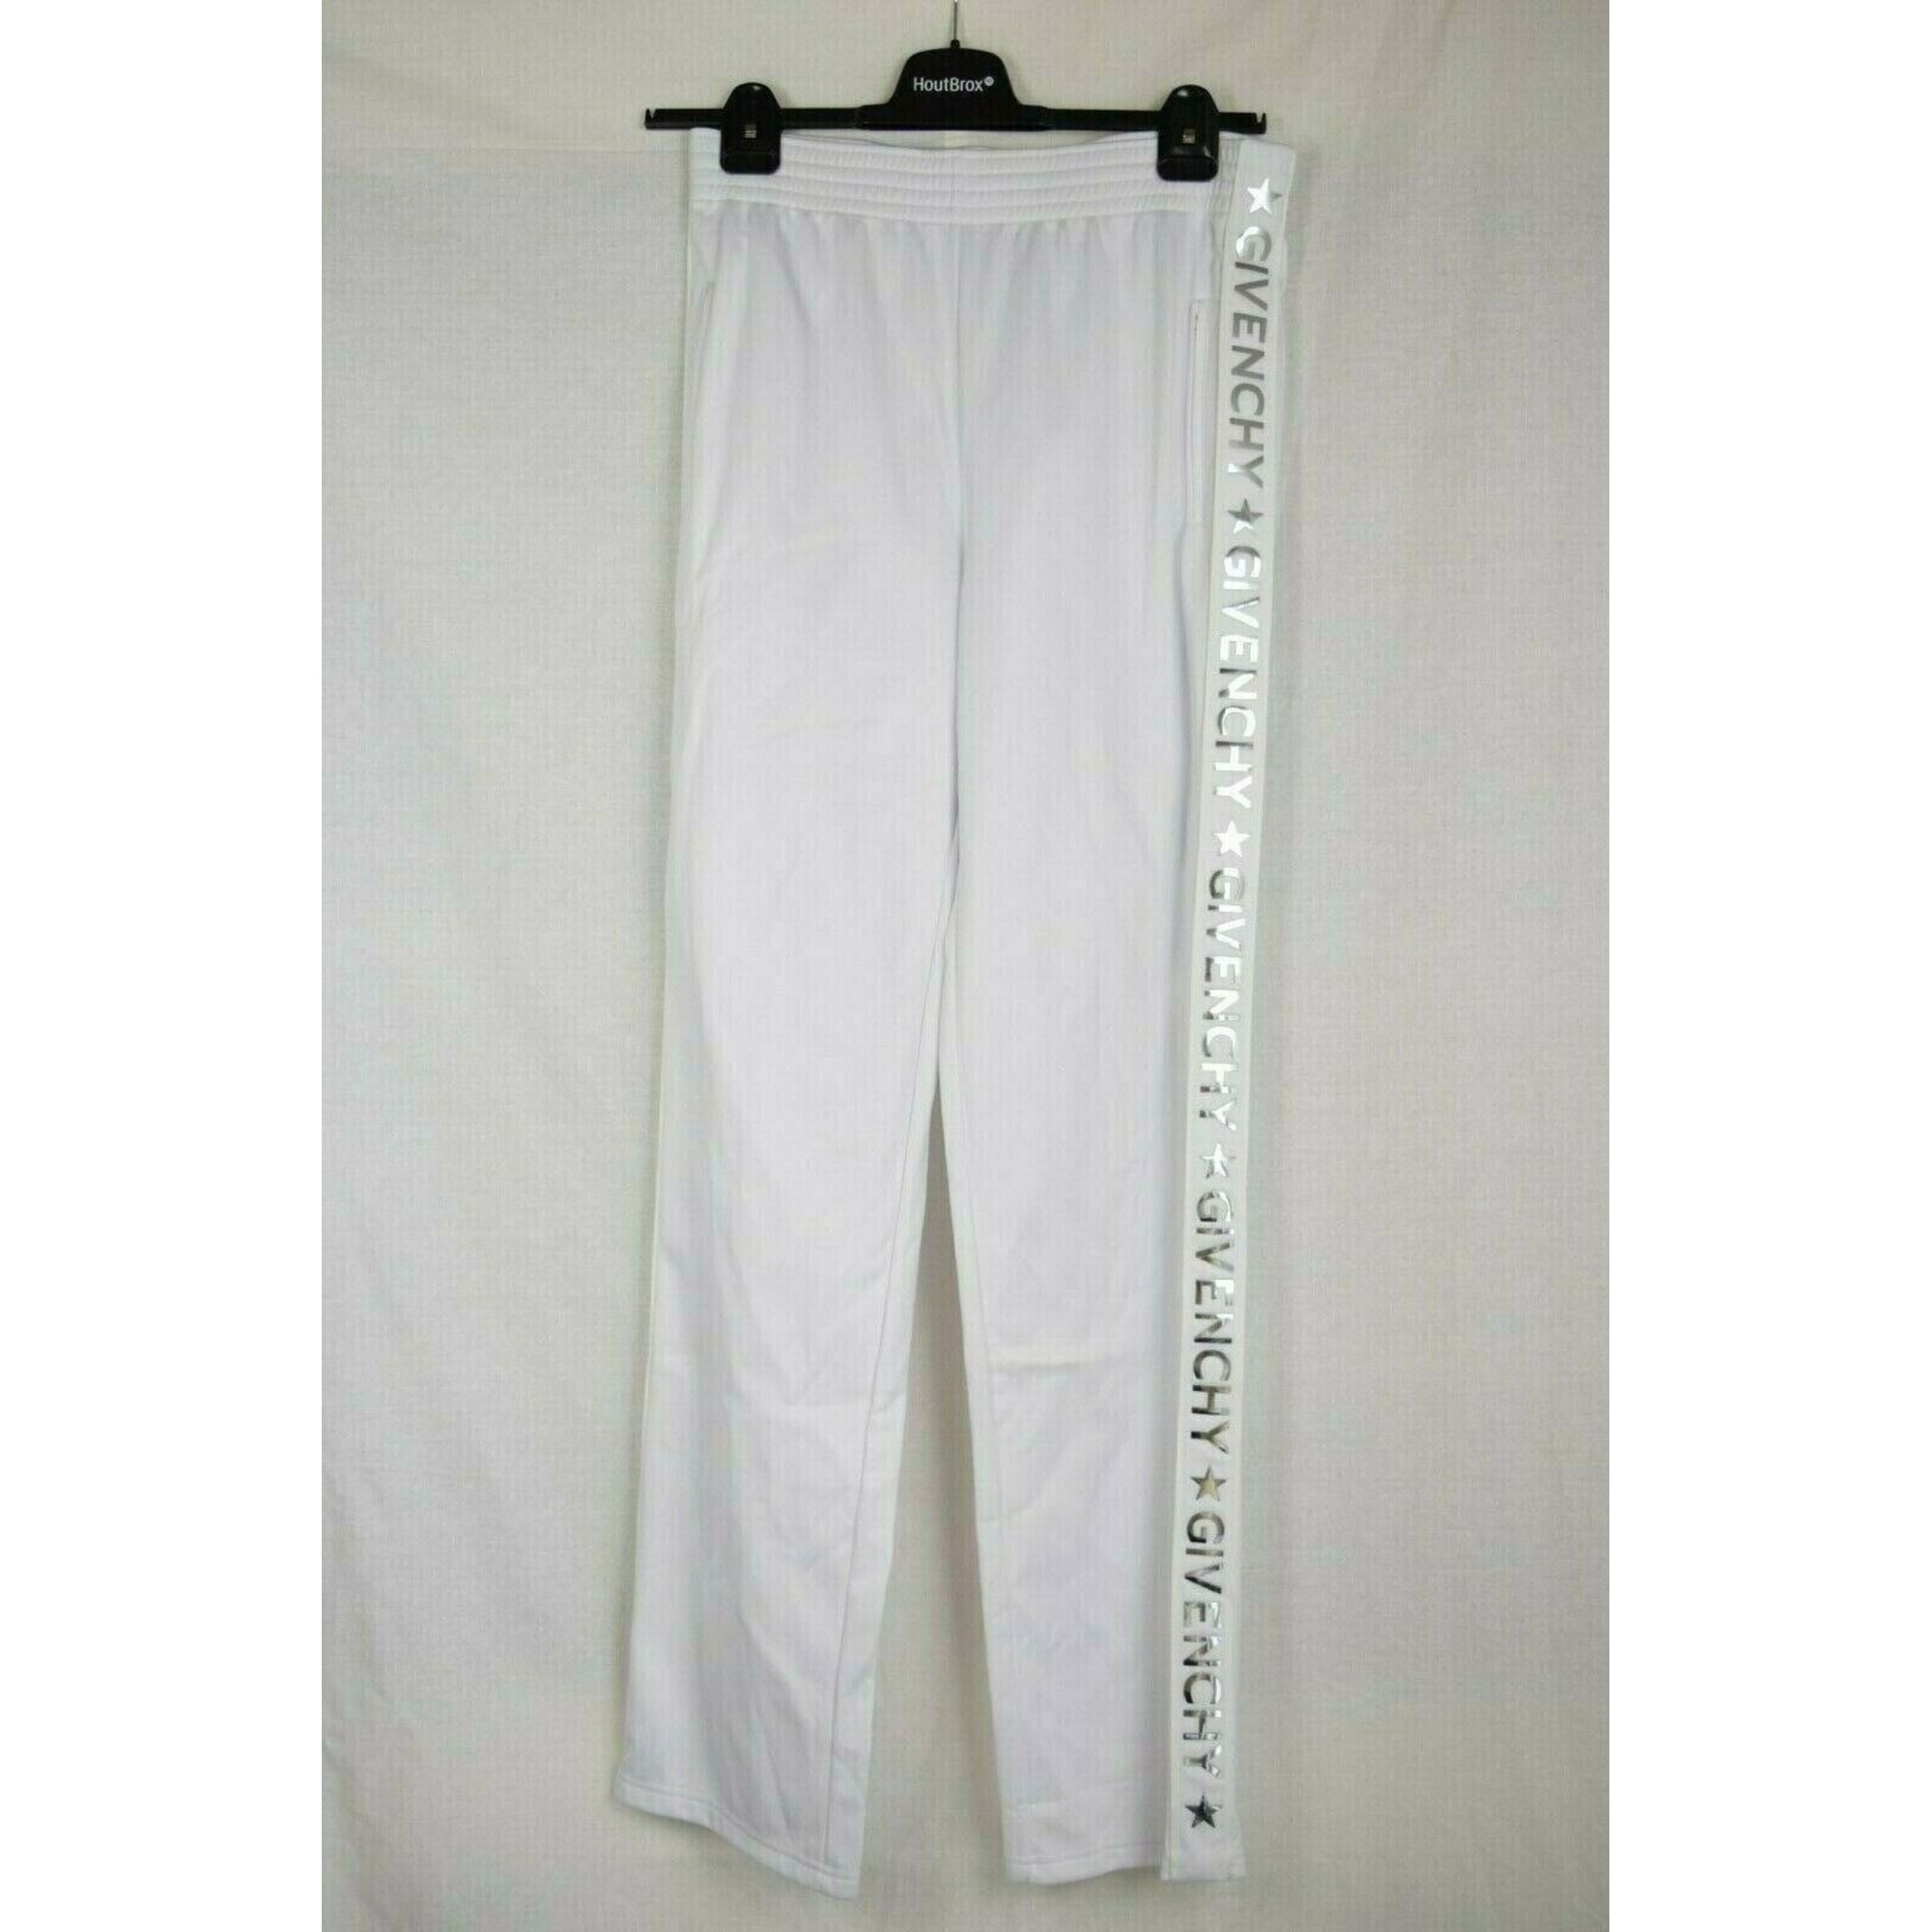 Pantalon droit GIVENCHY Blanc, blanc cassé, écru